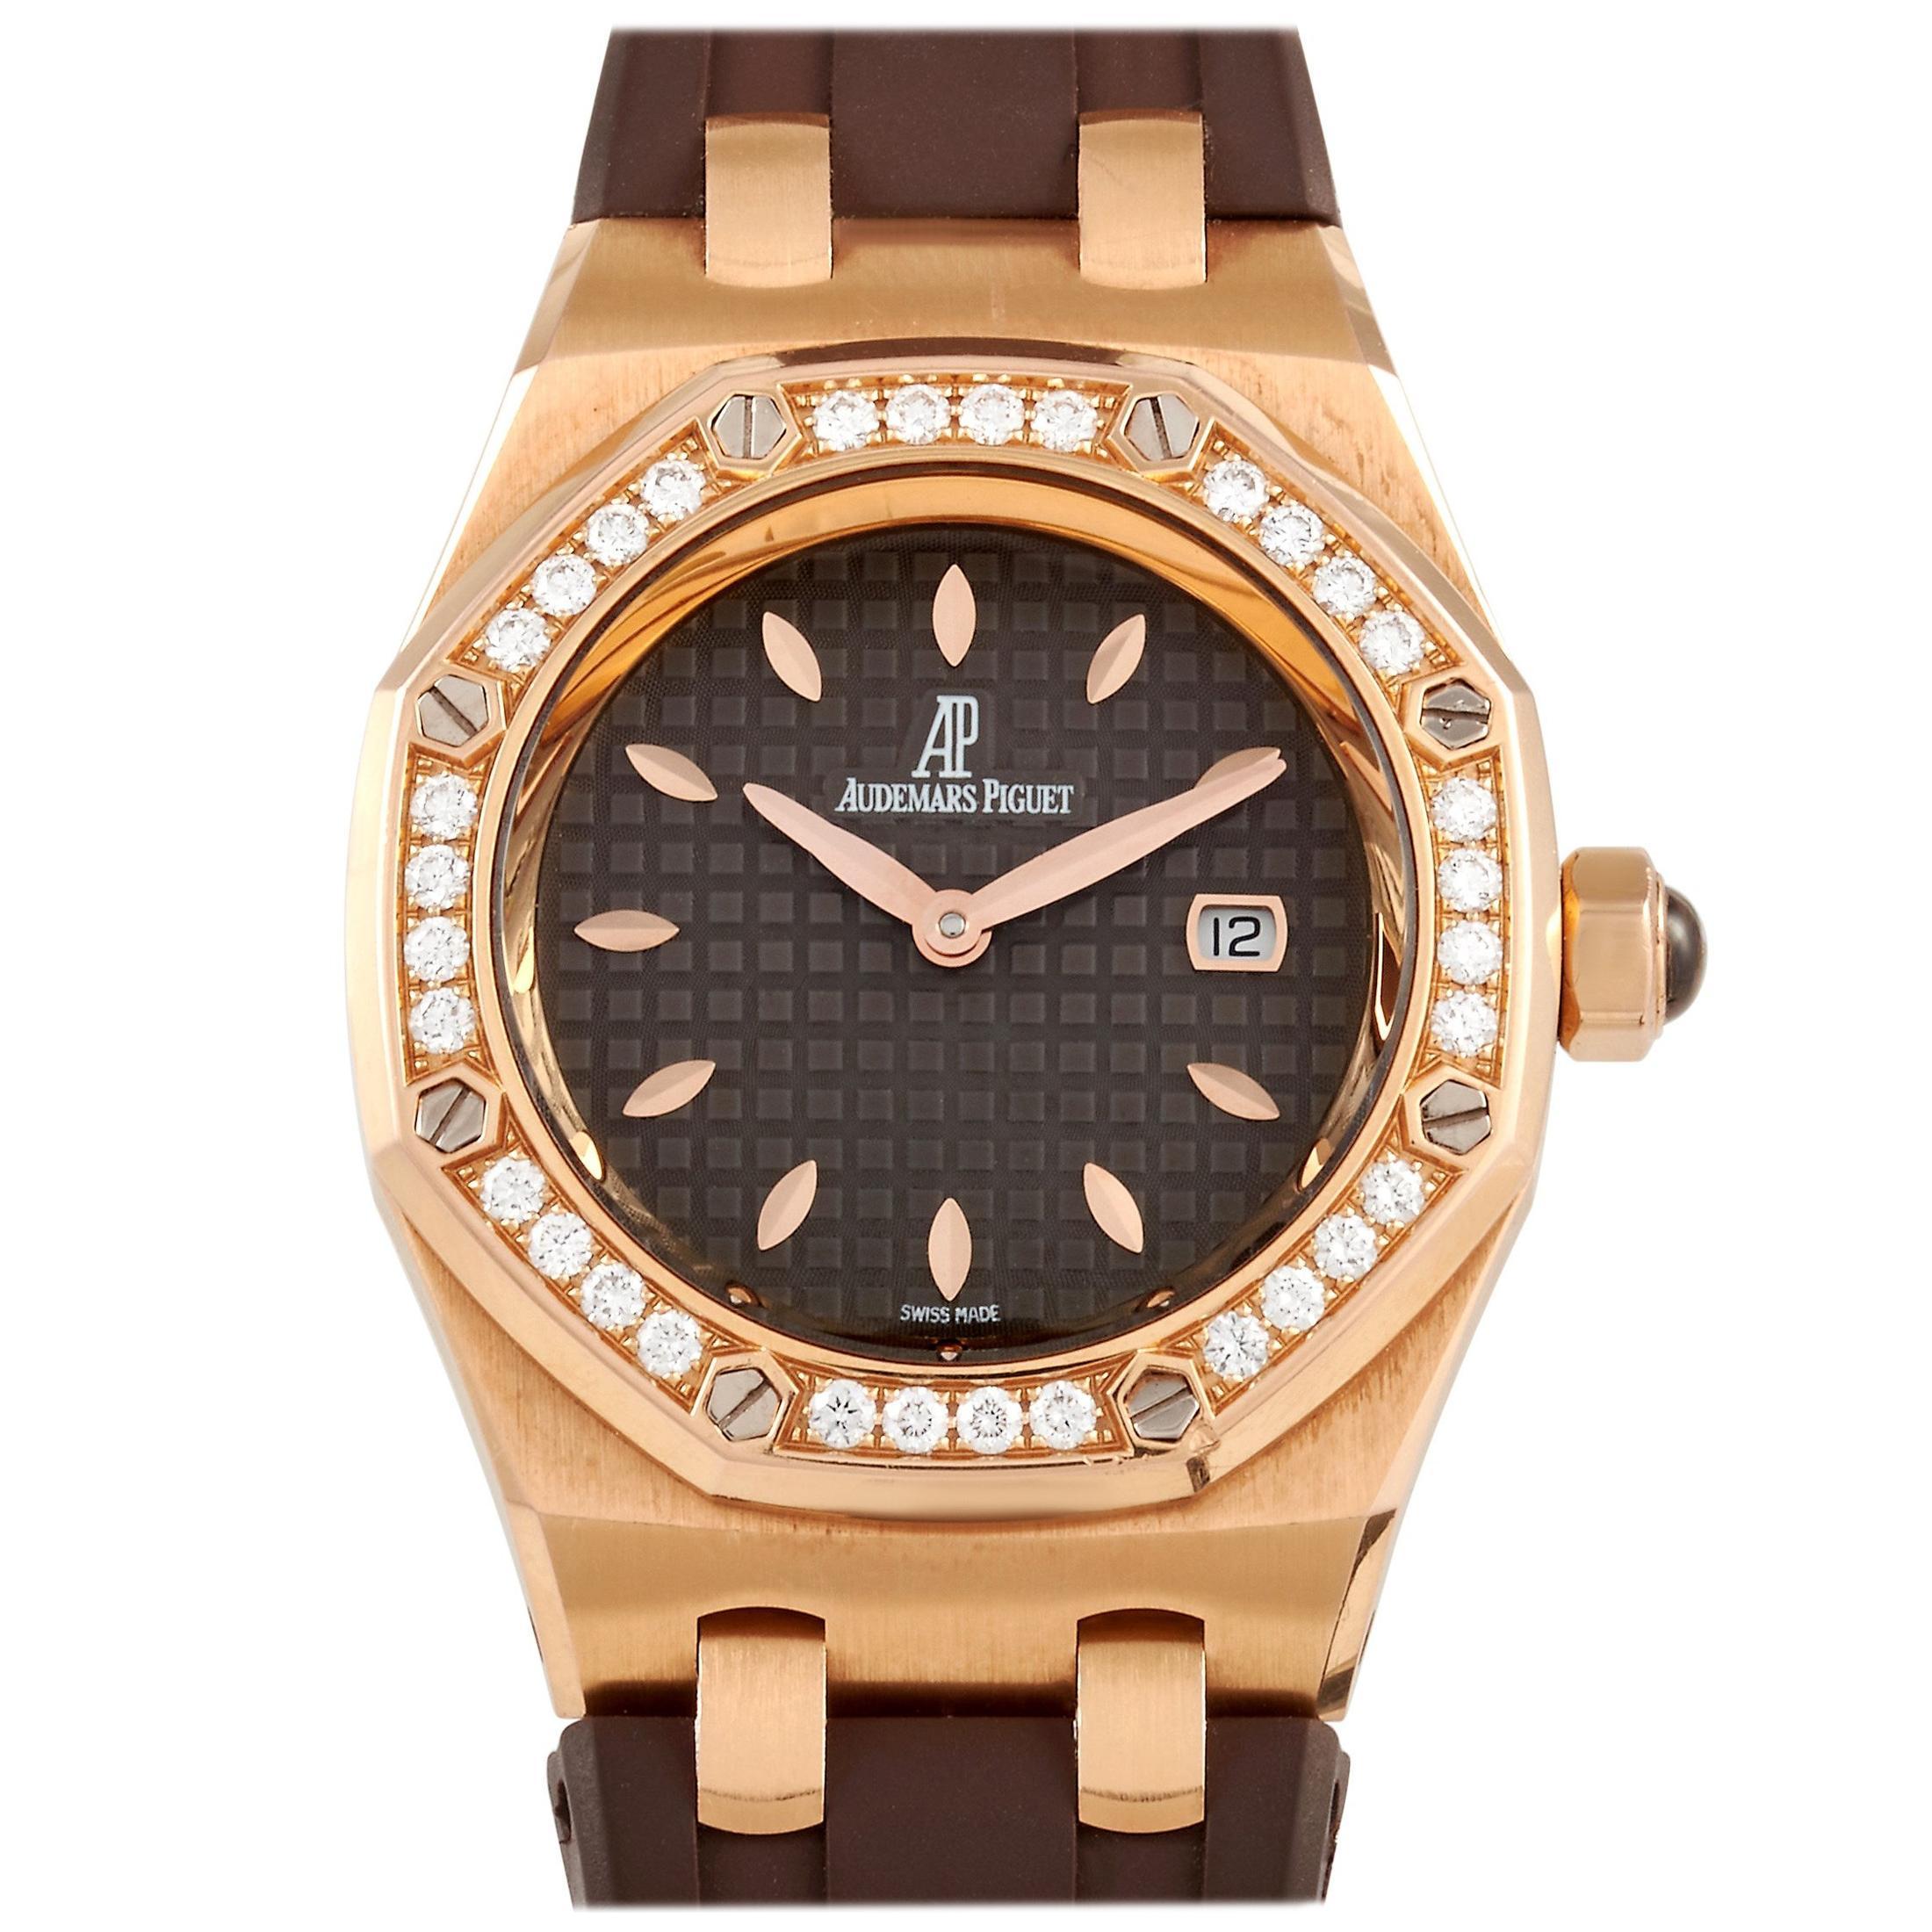 Audemars Piguet Royal Oak Lady Automatic Khanjar Watch 77321OR.ZZ.D080CA.01